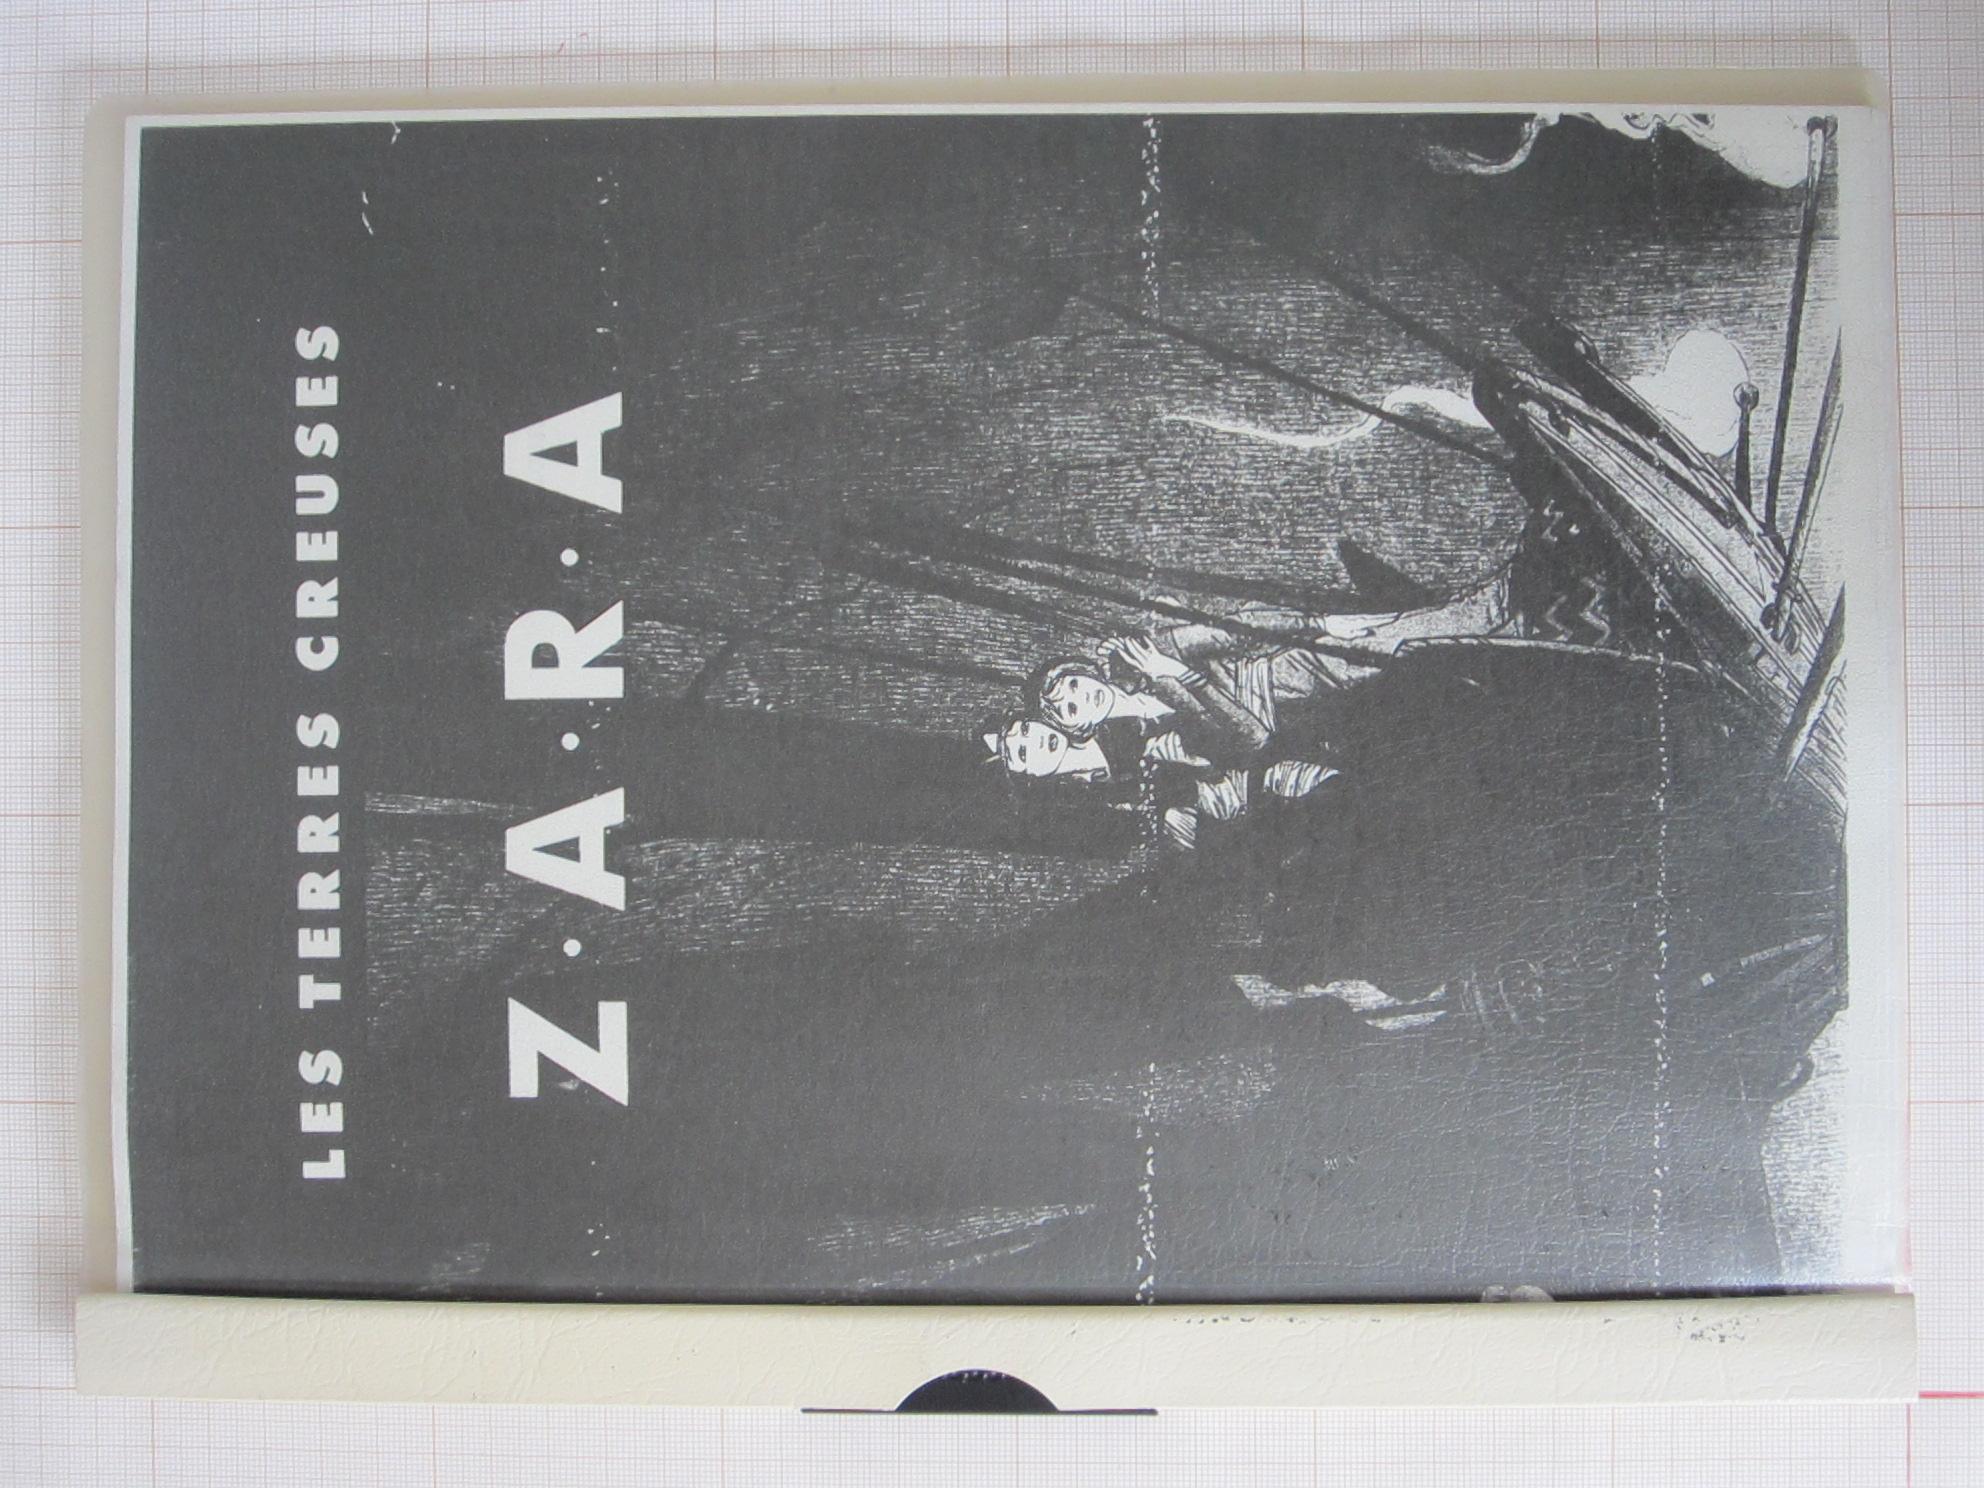 Les terres creuses: ZARA© Ingrid Louis, 1984